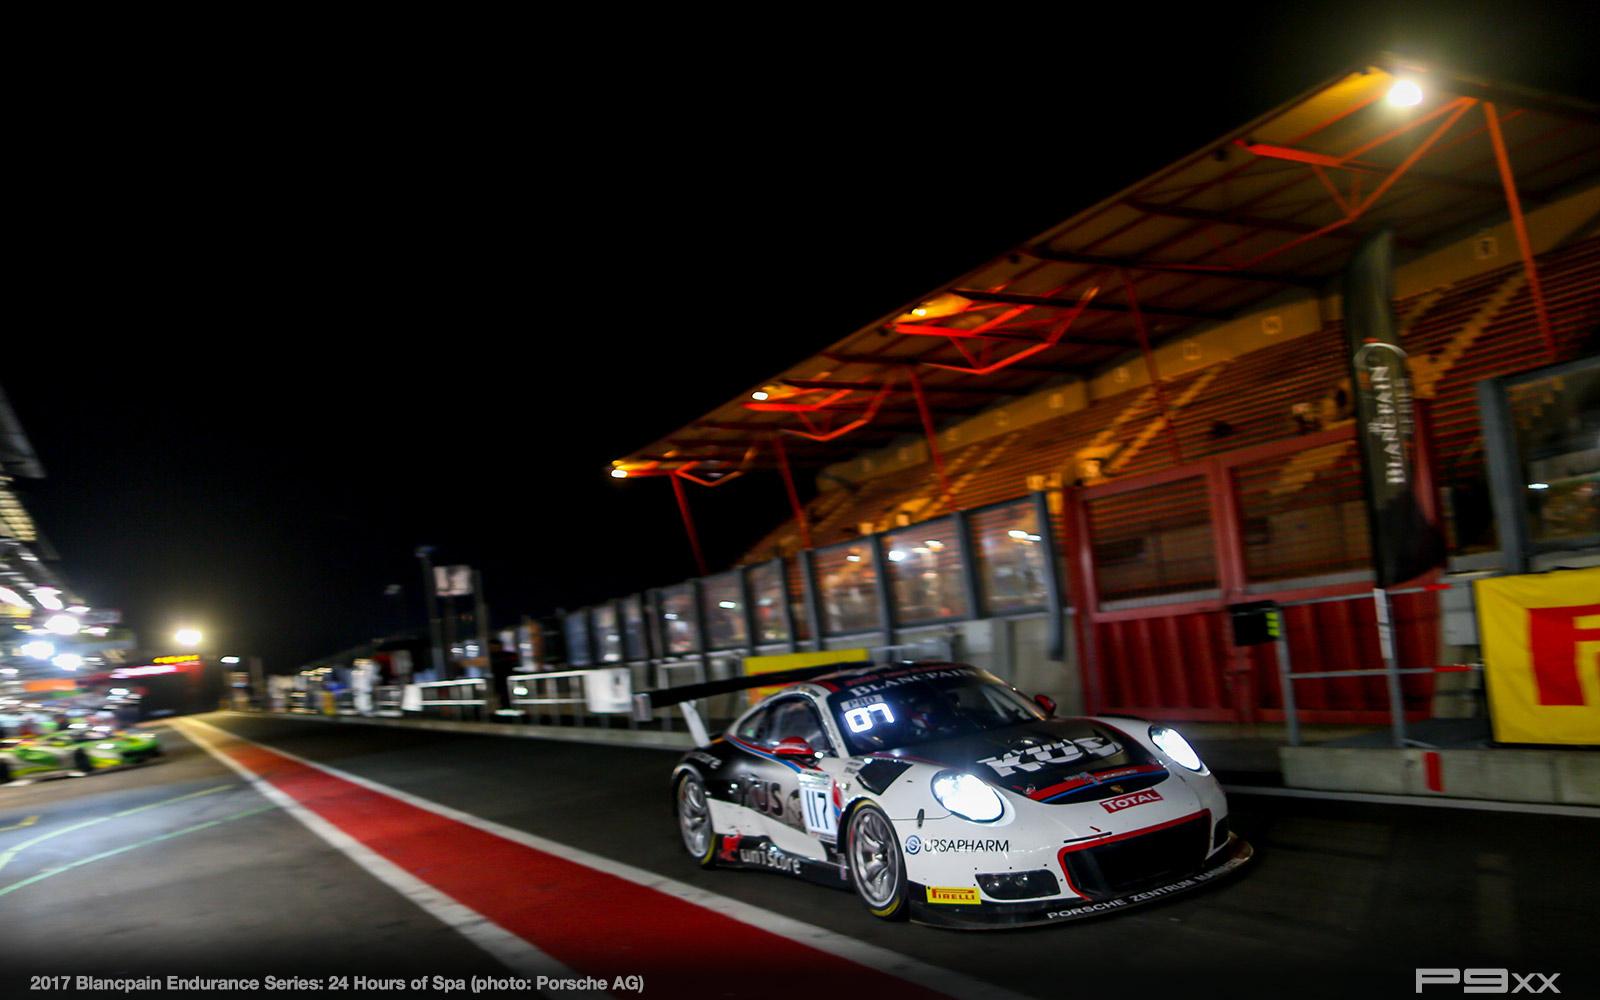 2017-24-Hours-of-Spa-Porsche-333